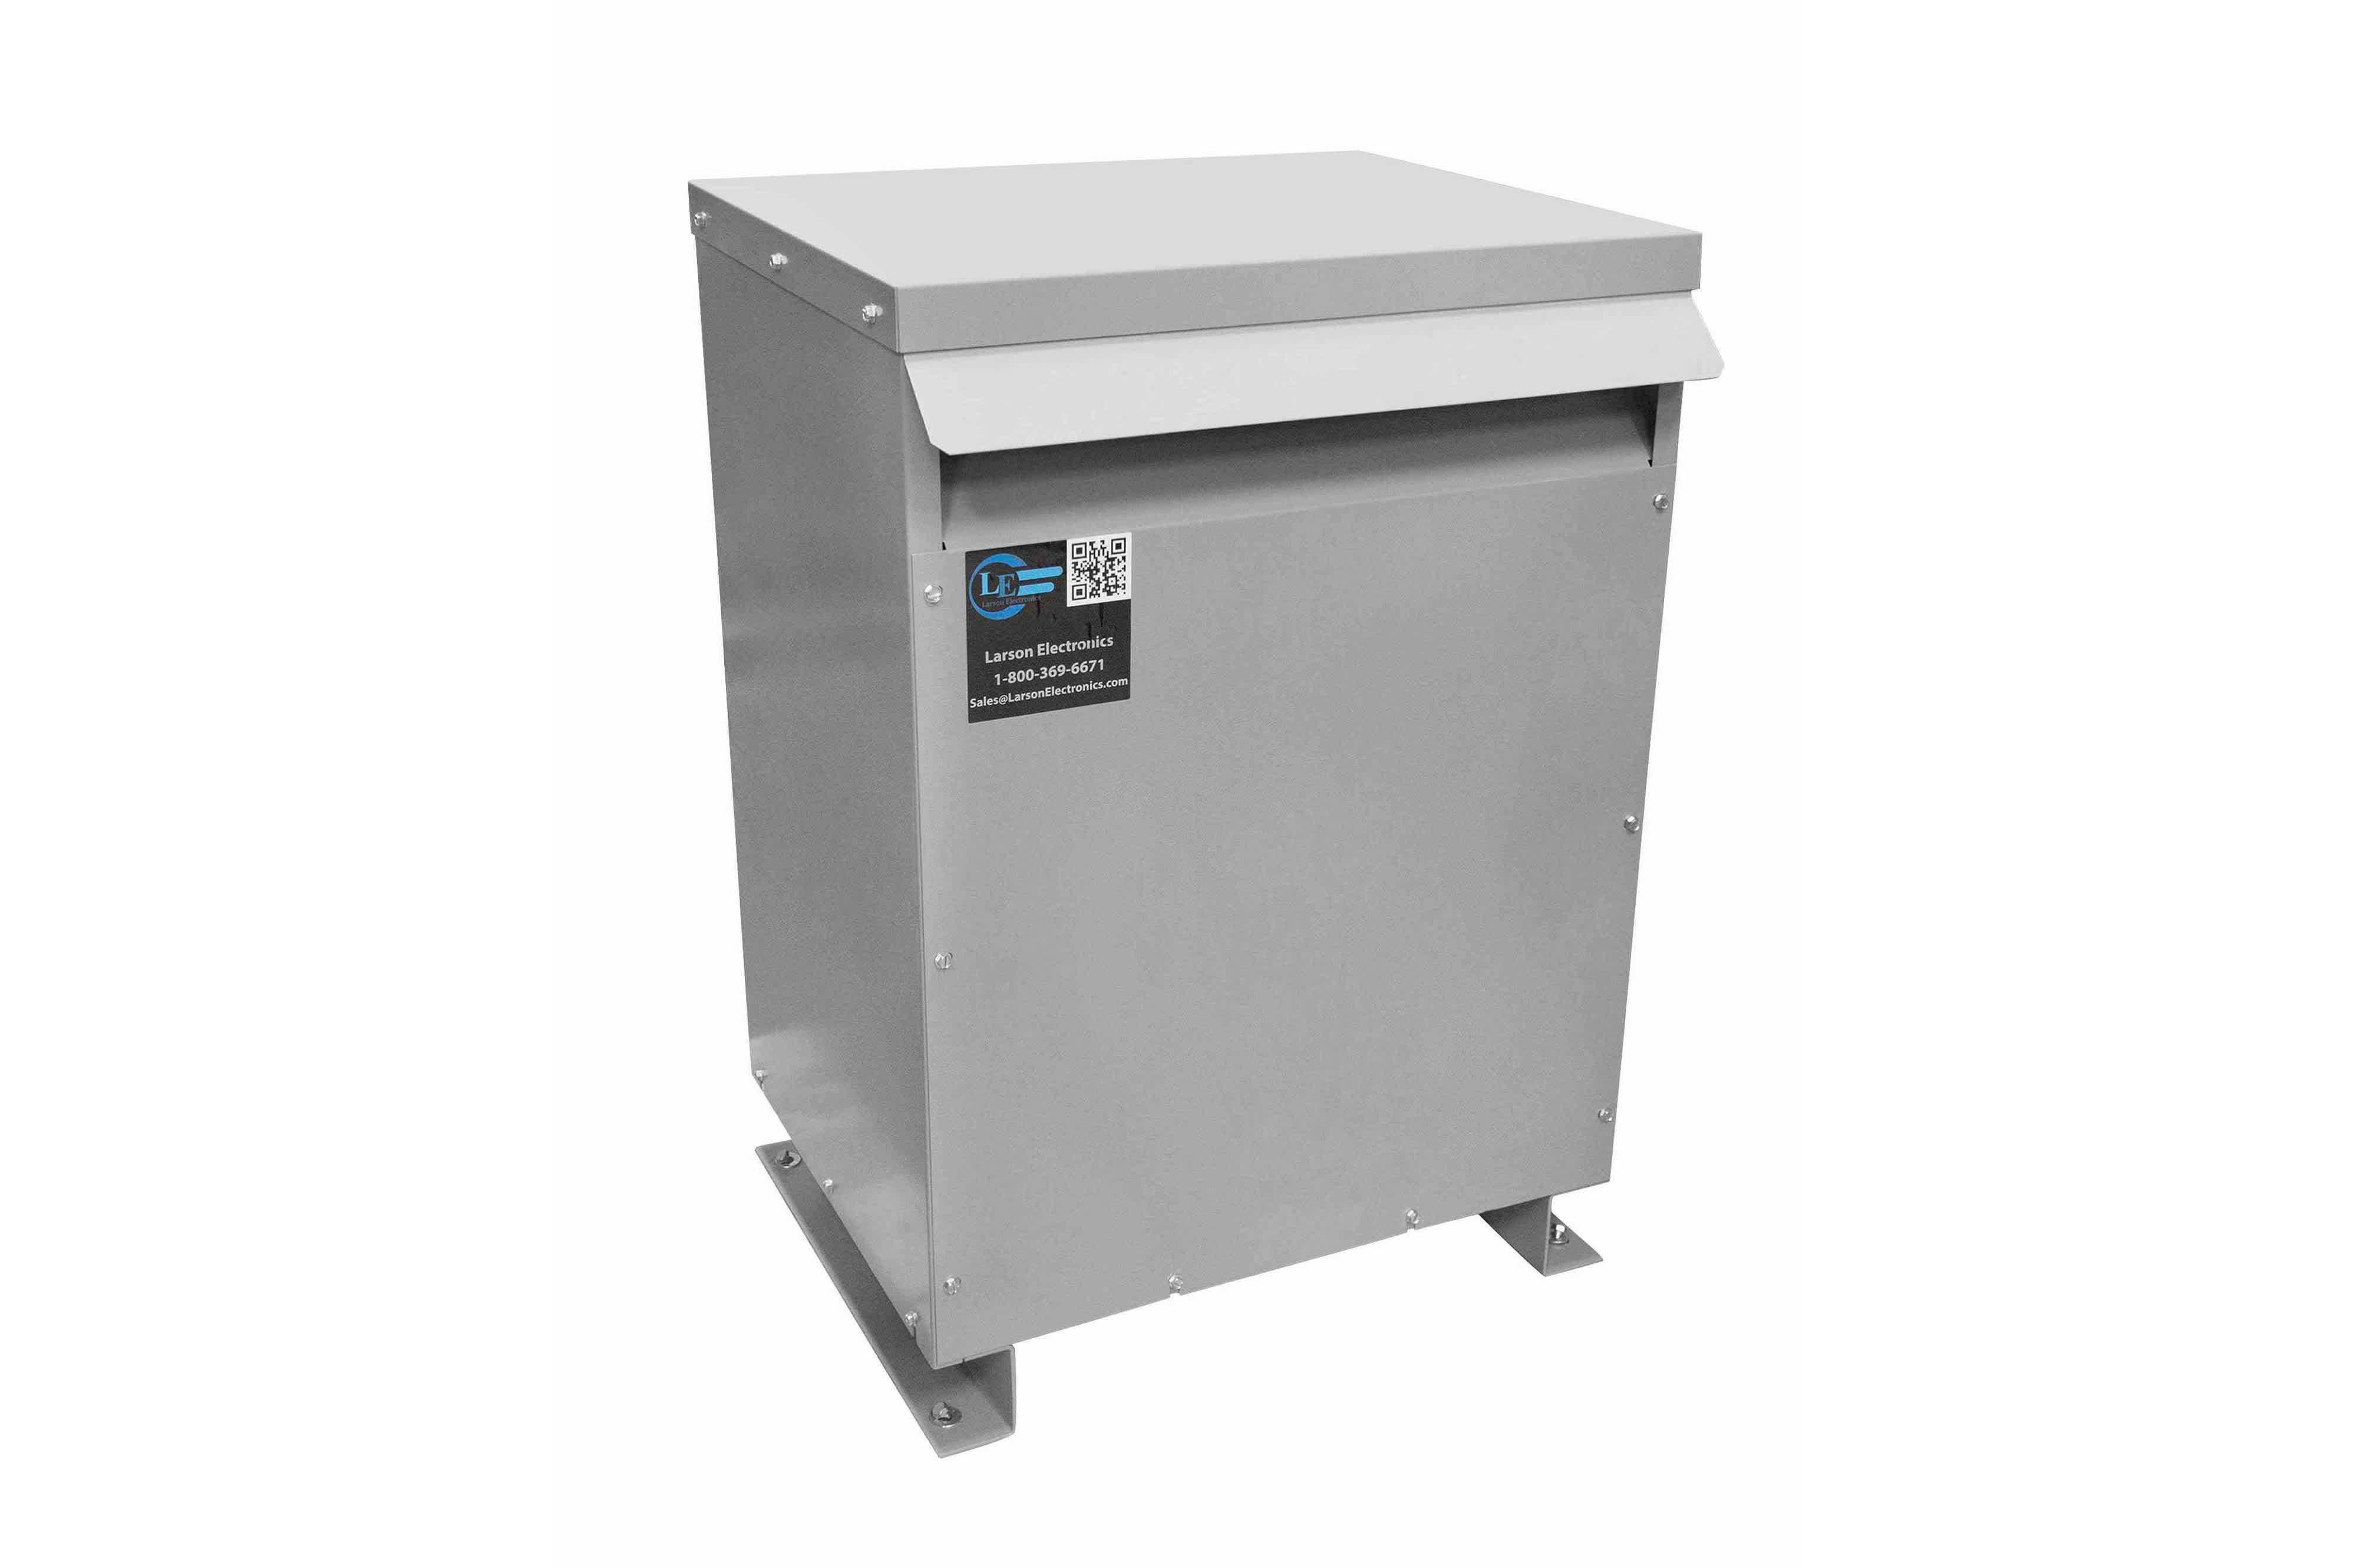 27 kVA 3PH Isolation Transformer, 208V Wye Primary, 600Y/347 Wye-N Secondary, N3R, Ventilated, 60 Hz